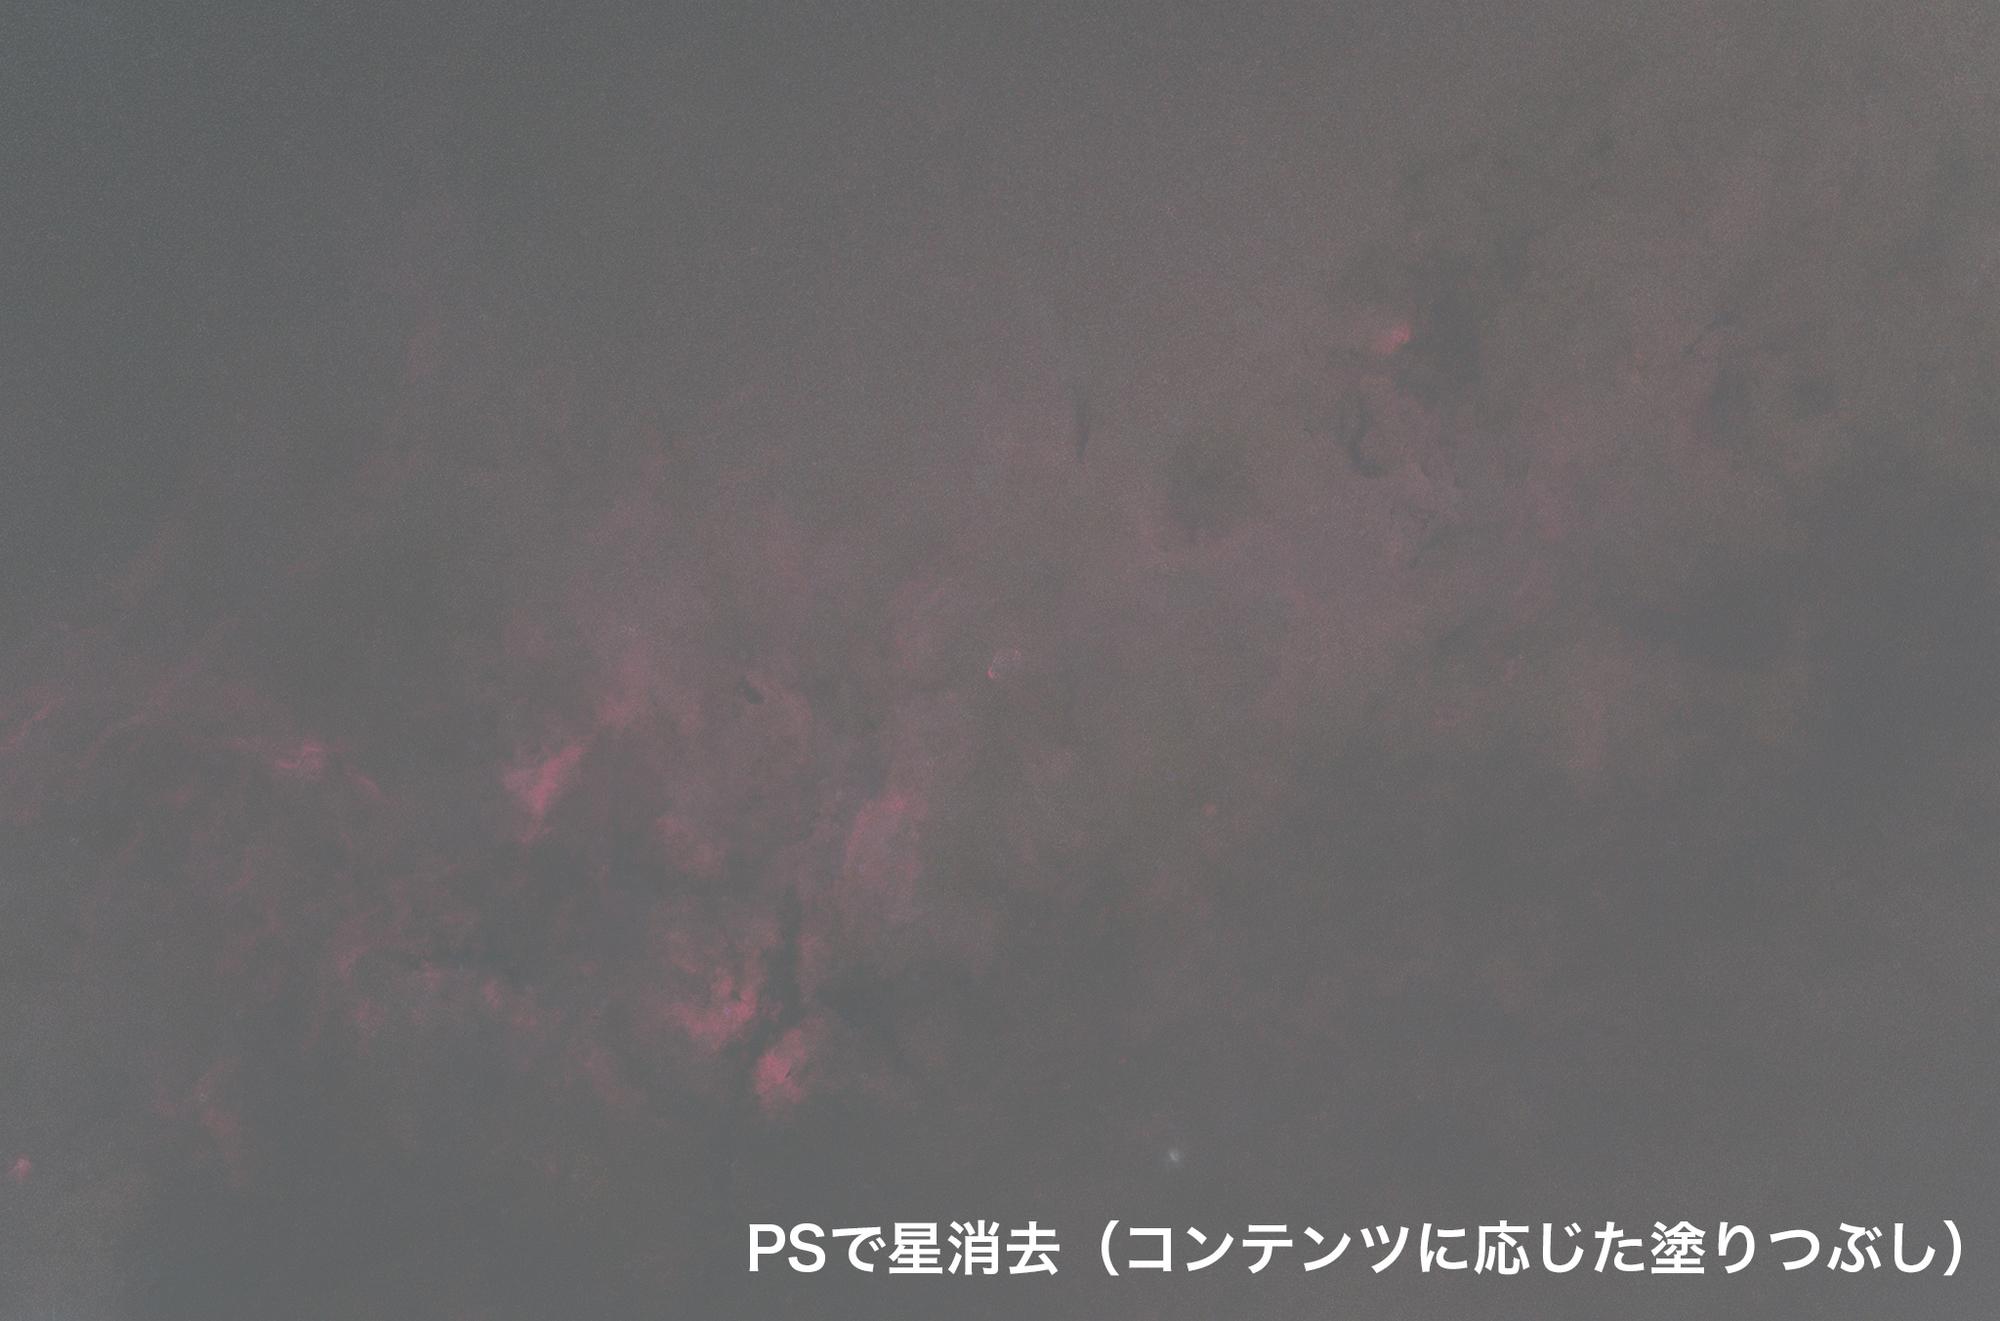 f:id:snct-astro:20190720021449j:plain